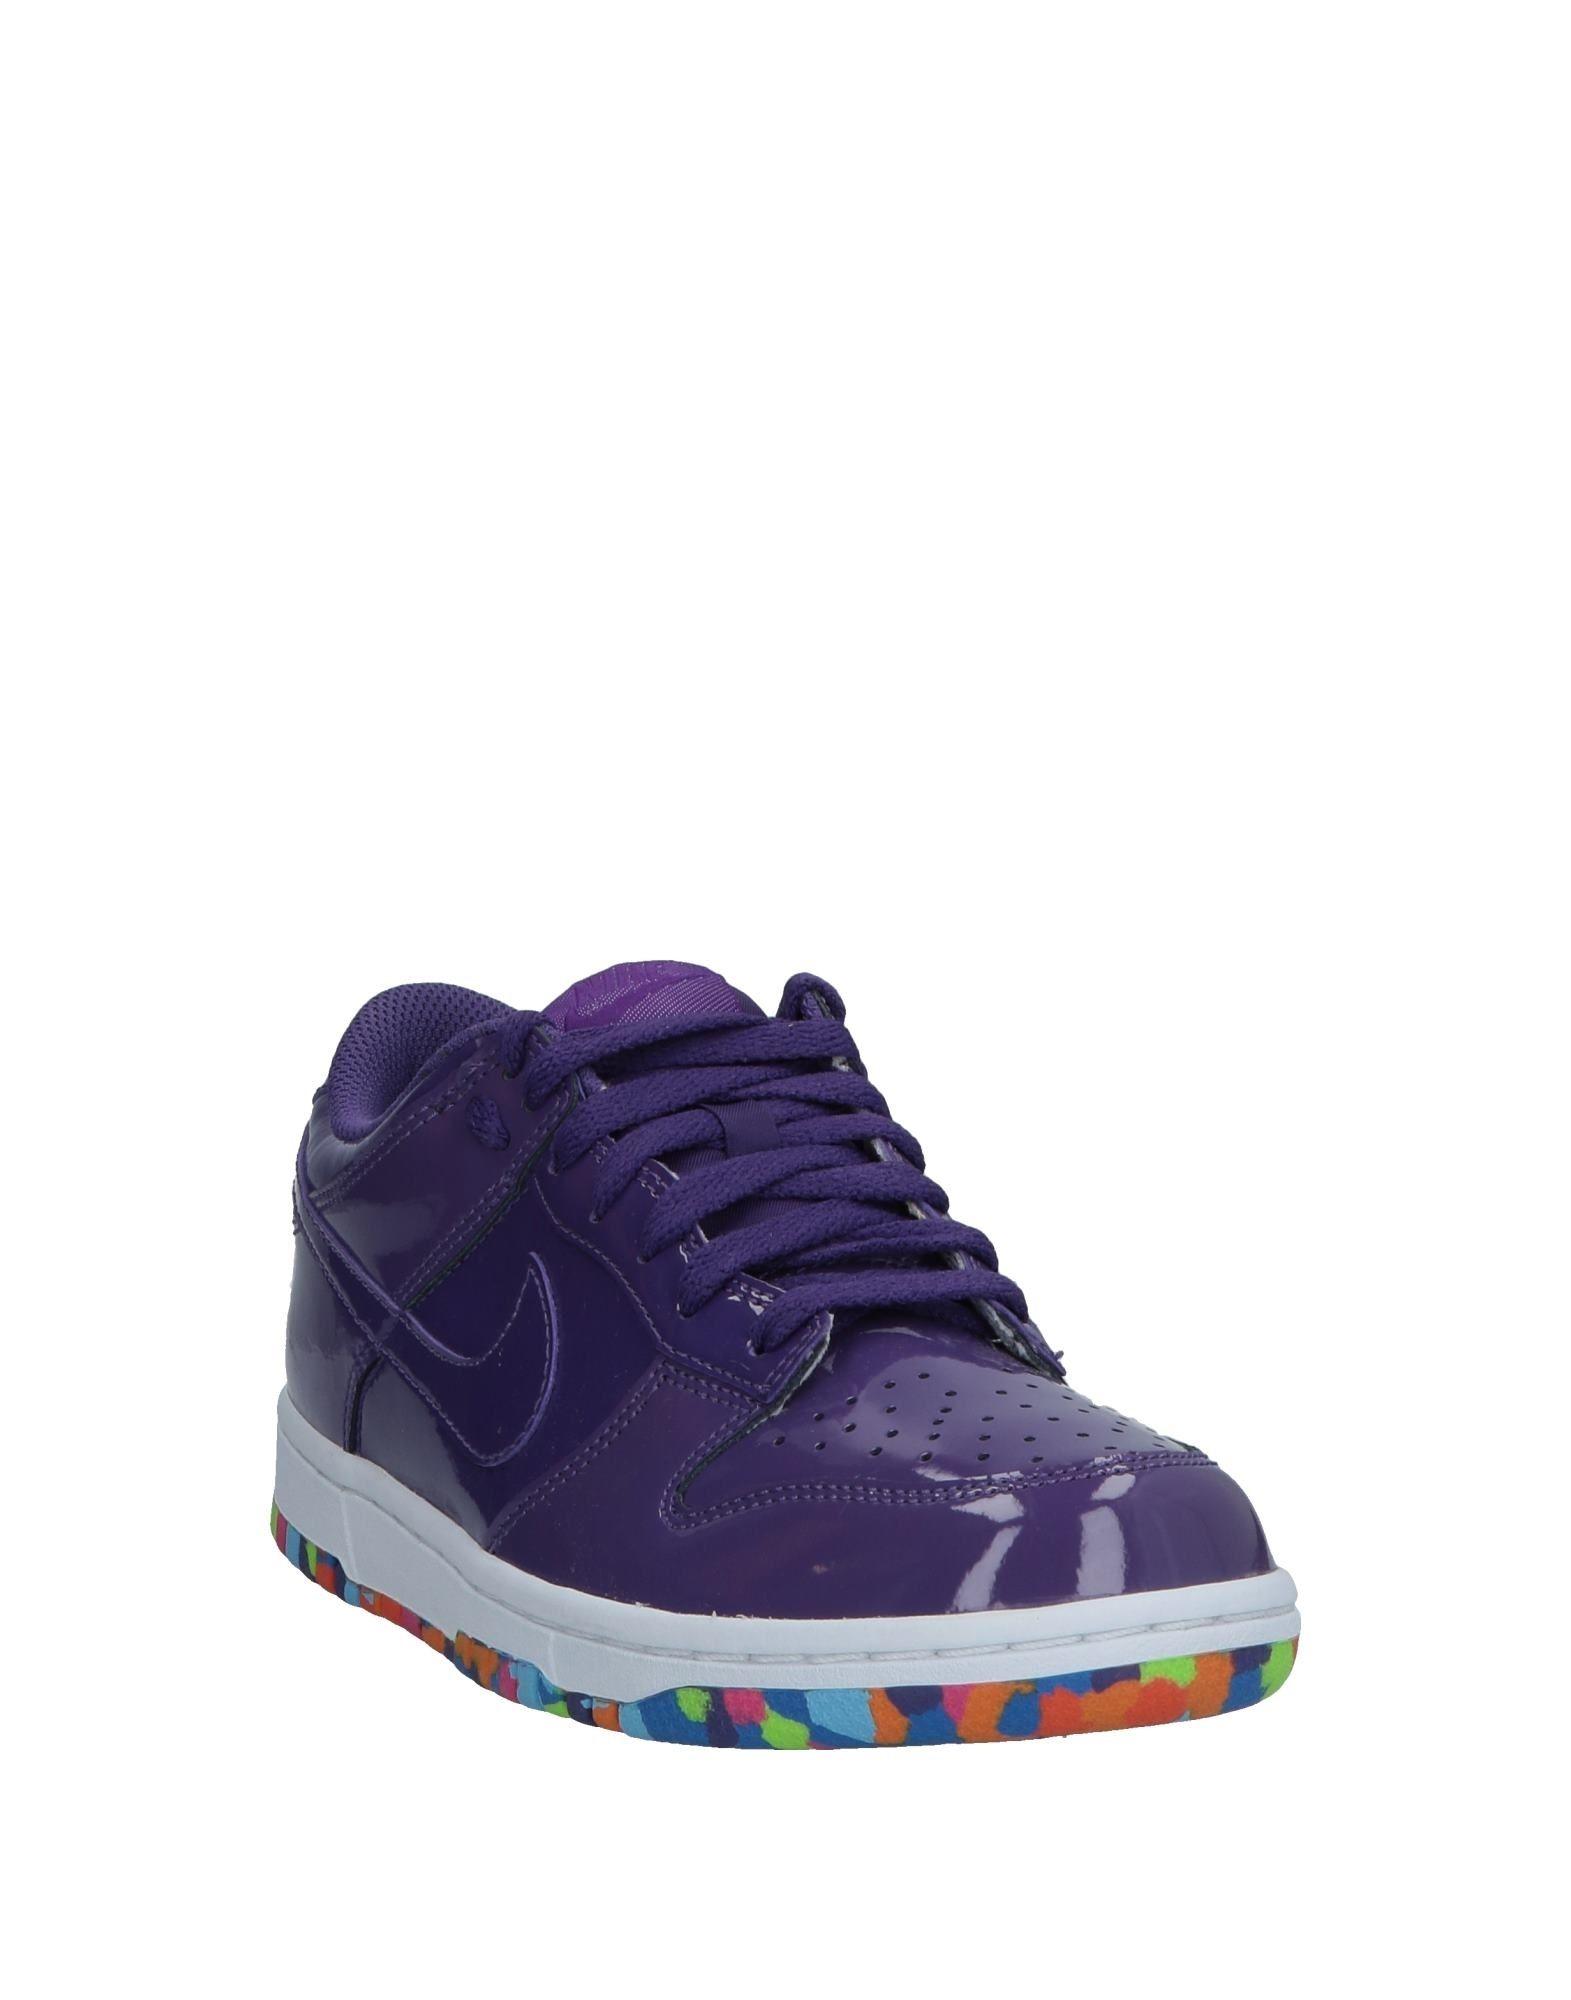 Nike Sneakers Damen aussehende  11571618OWGut aussehende Damen strapazierfähige Schuhe 96732e